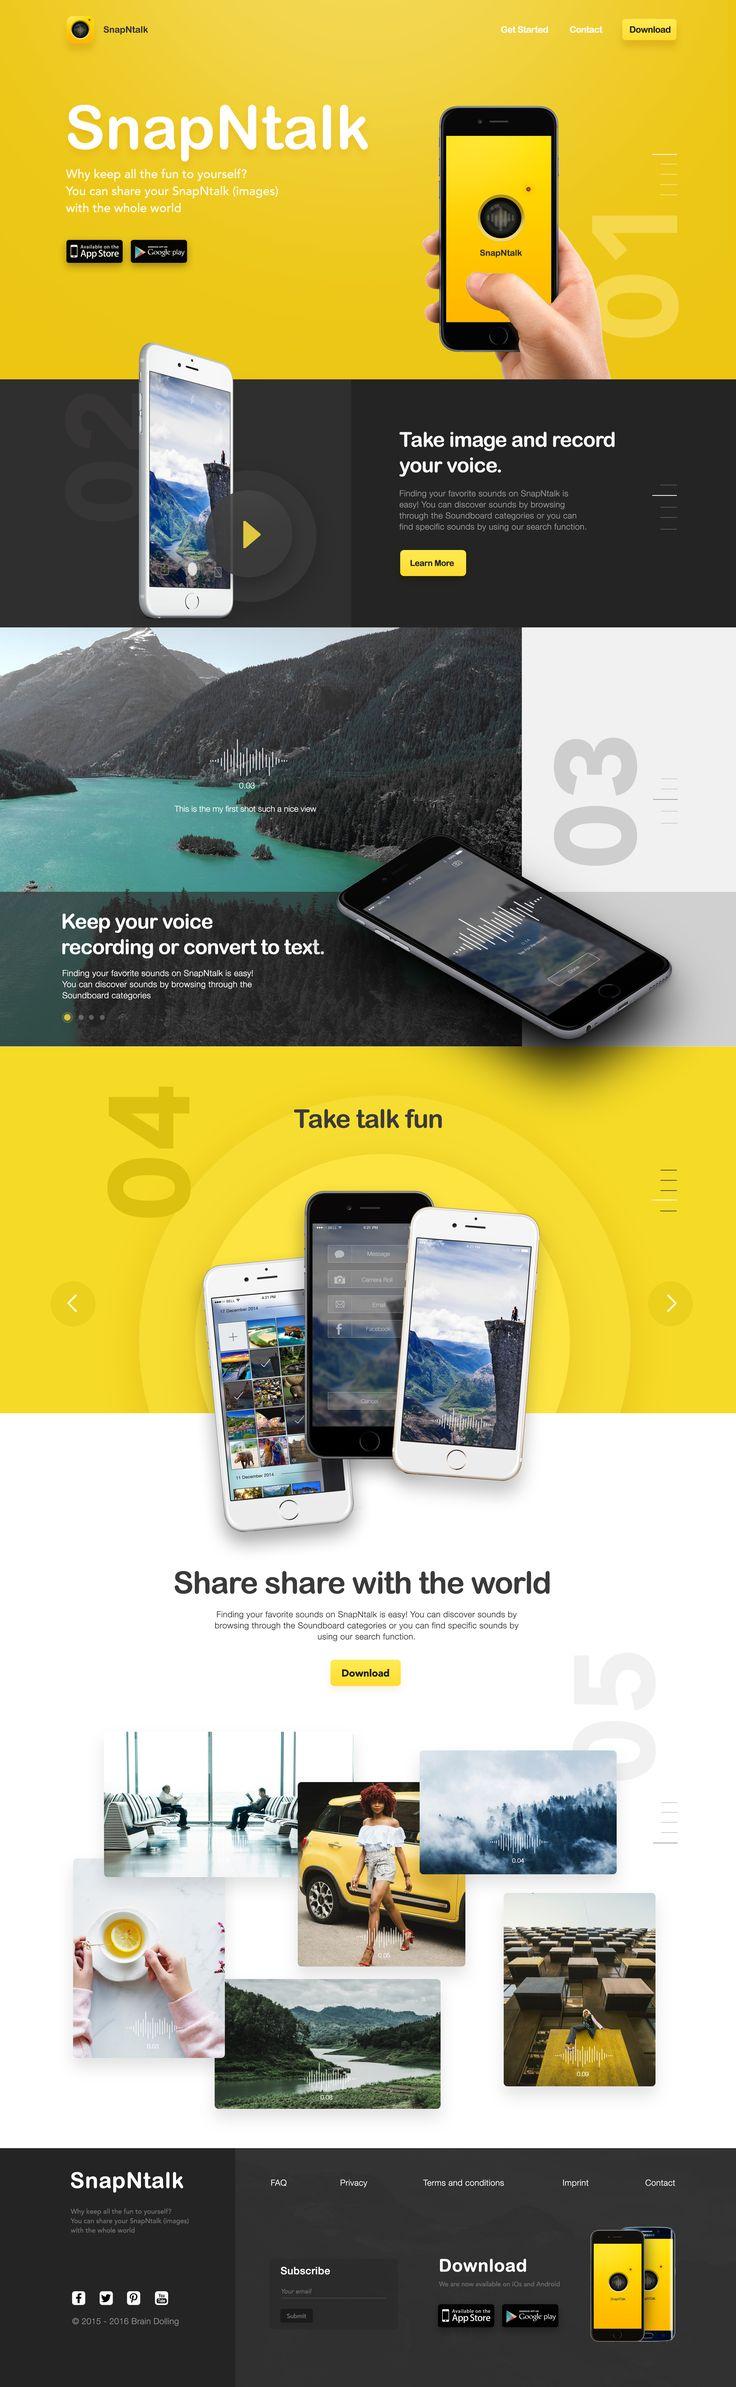 web design camera web design app  ui ux Dribbble shot yellow photo